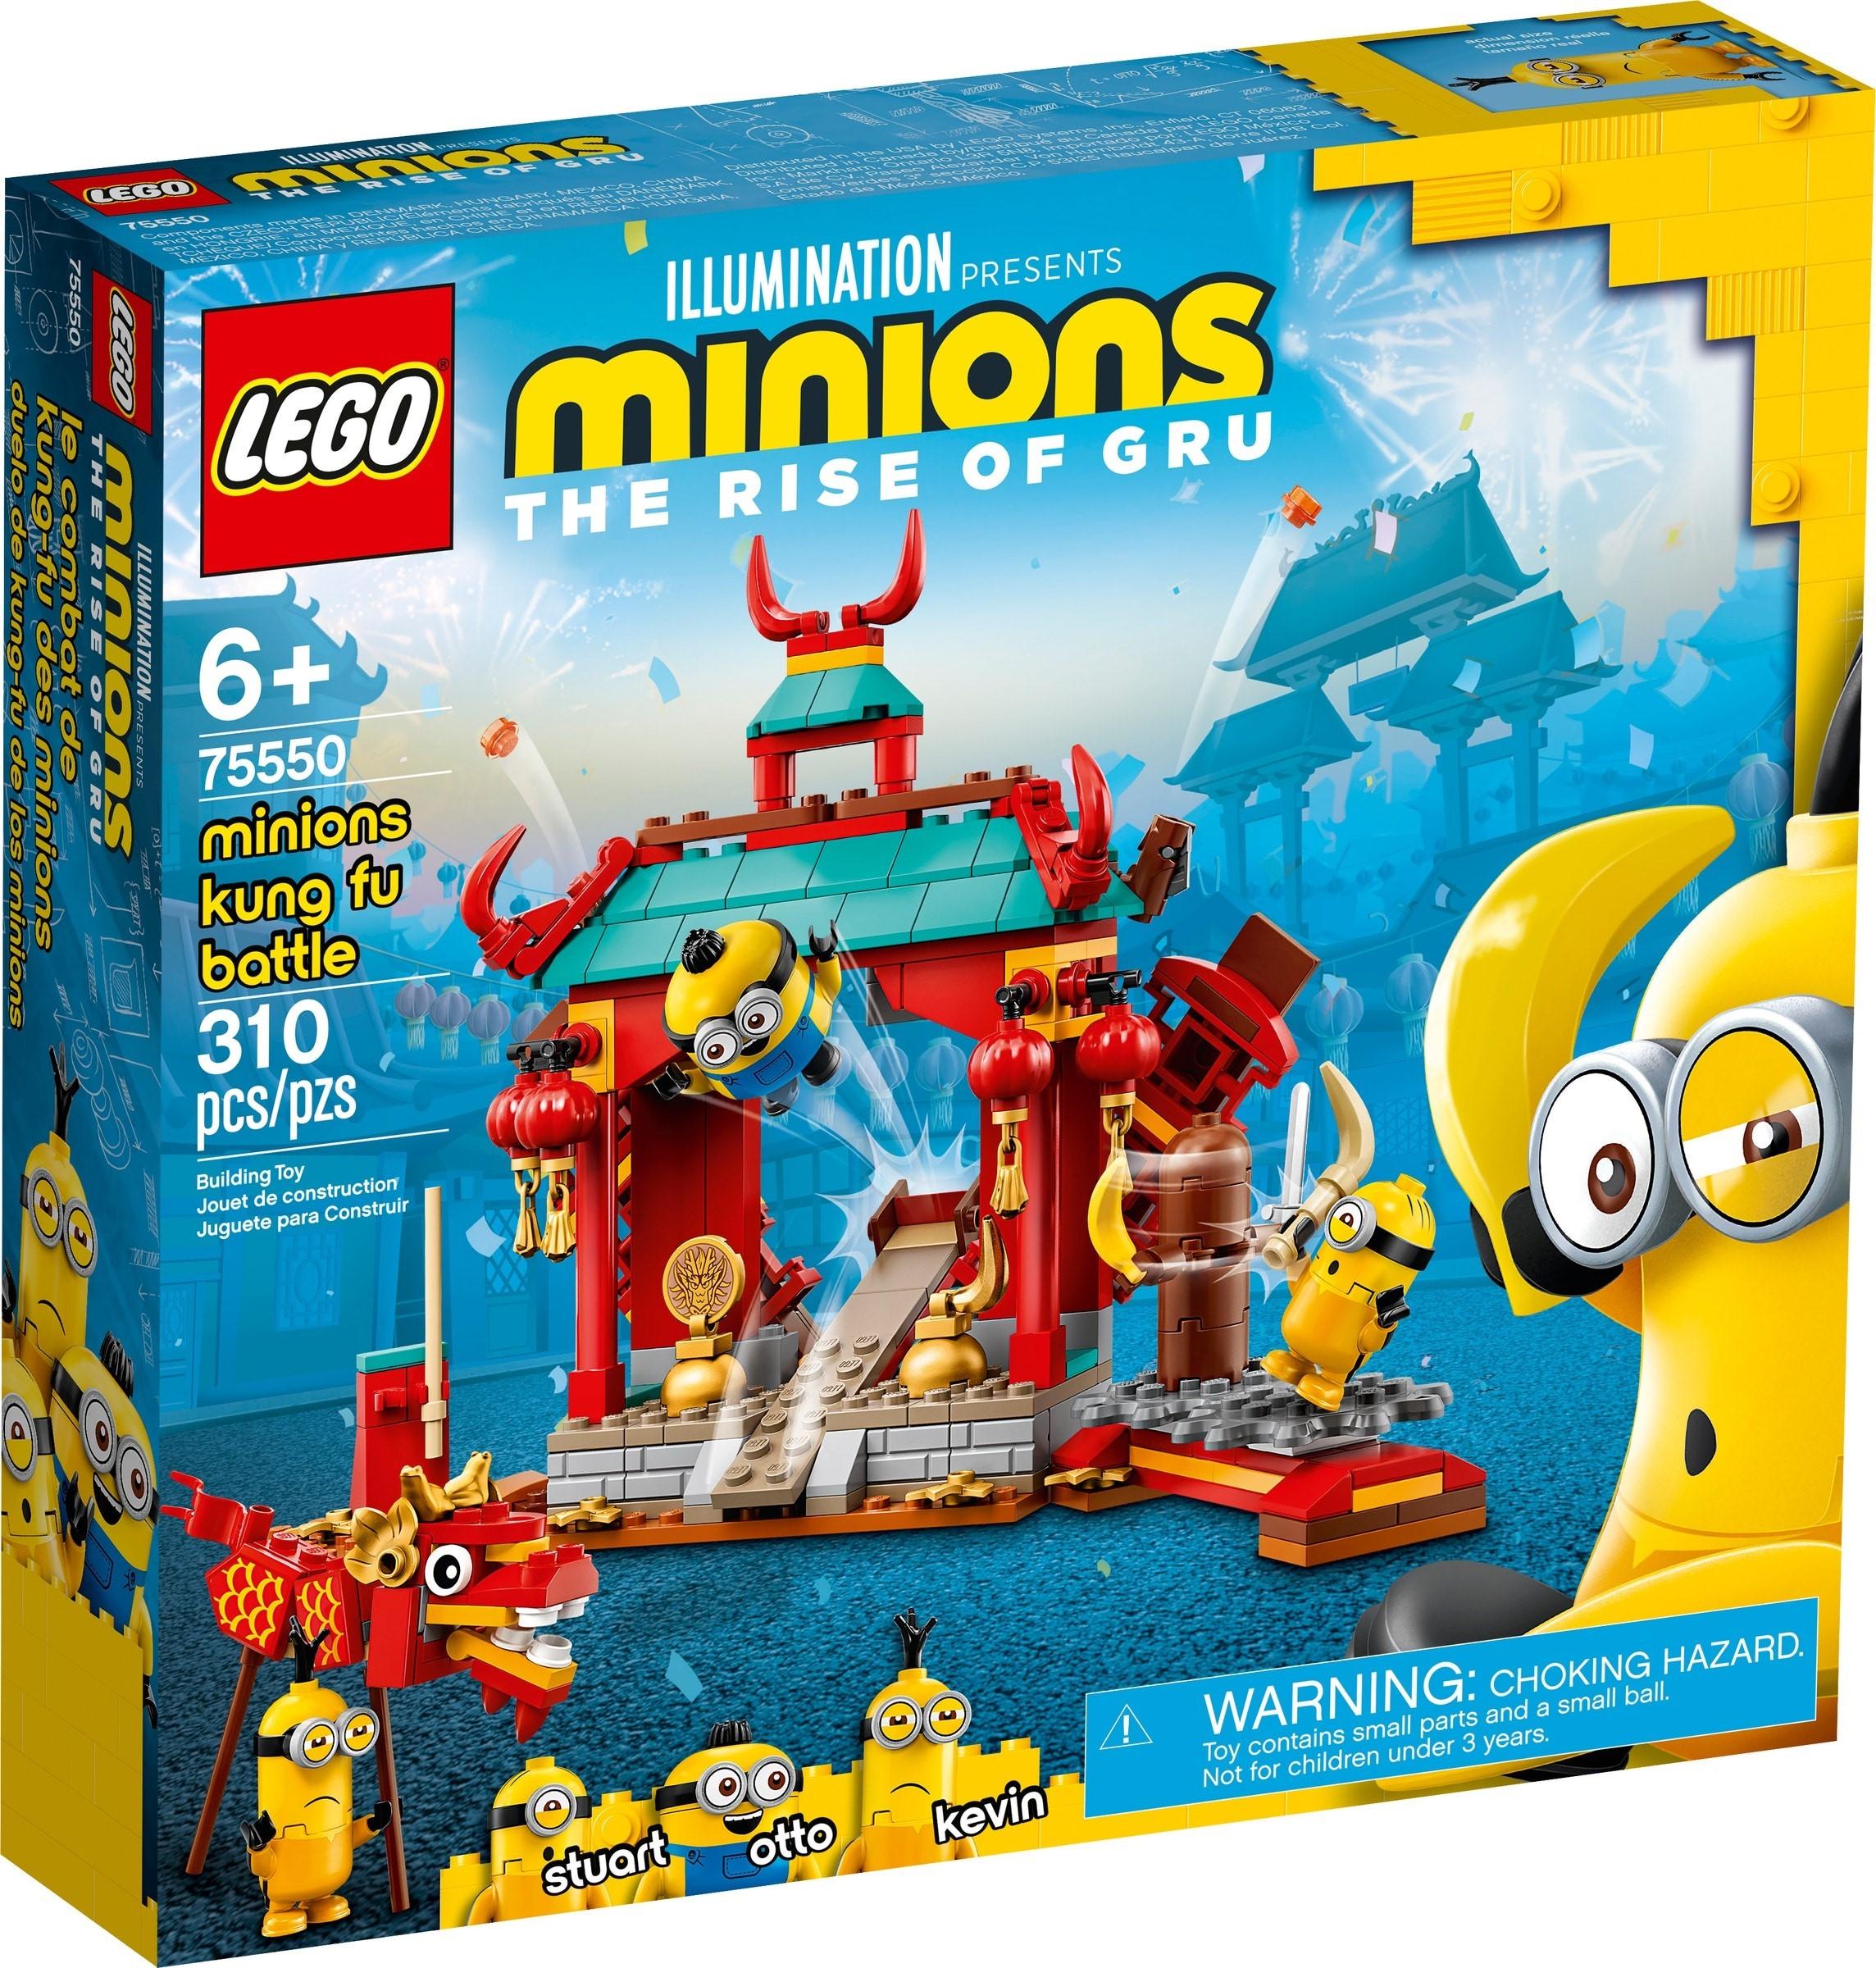 LEGO Minions - Minions Kung Fu Battle (75550)